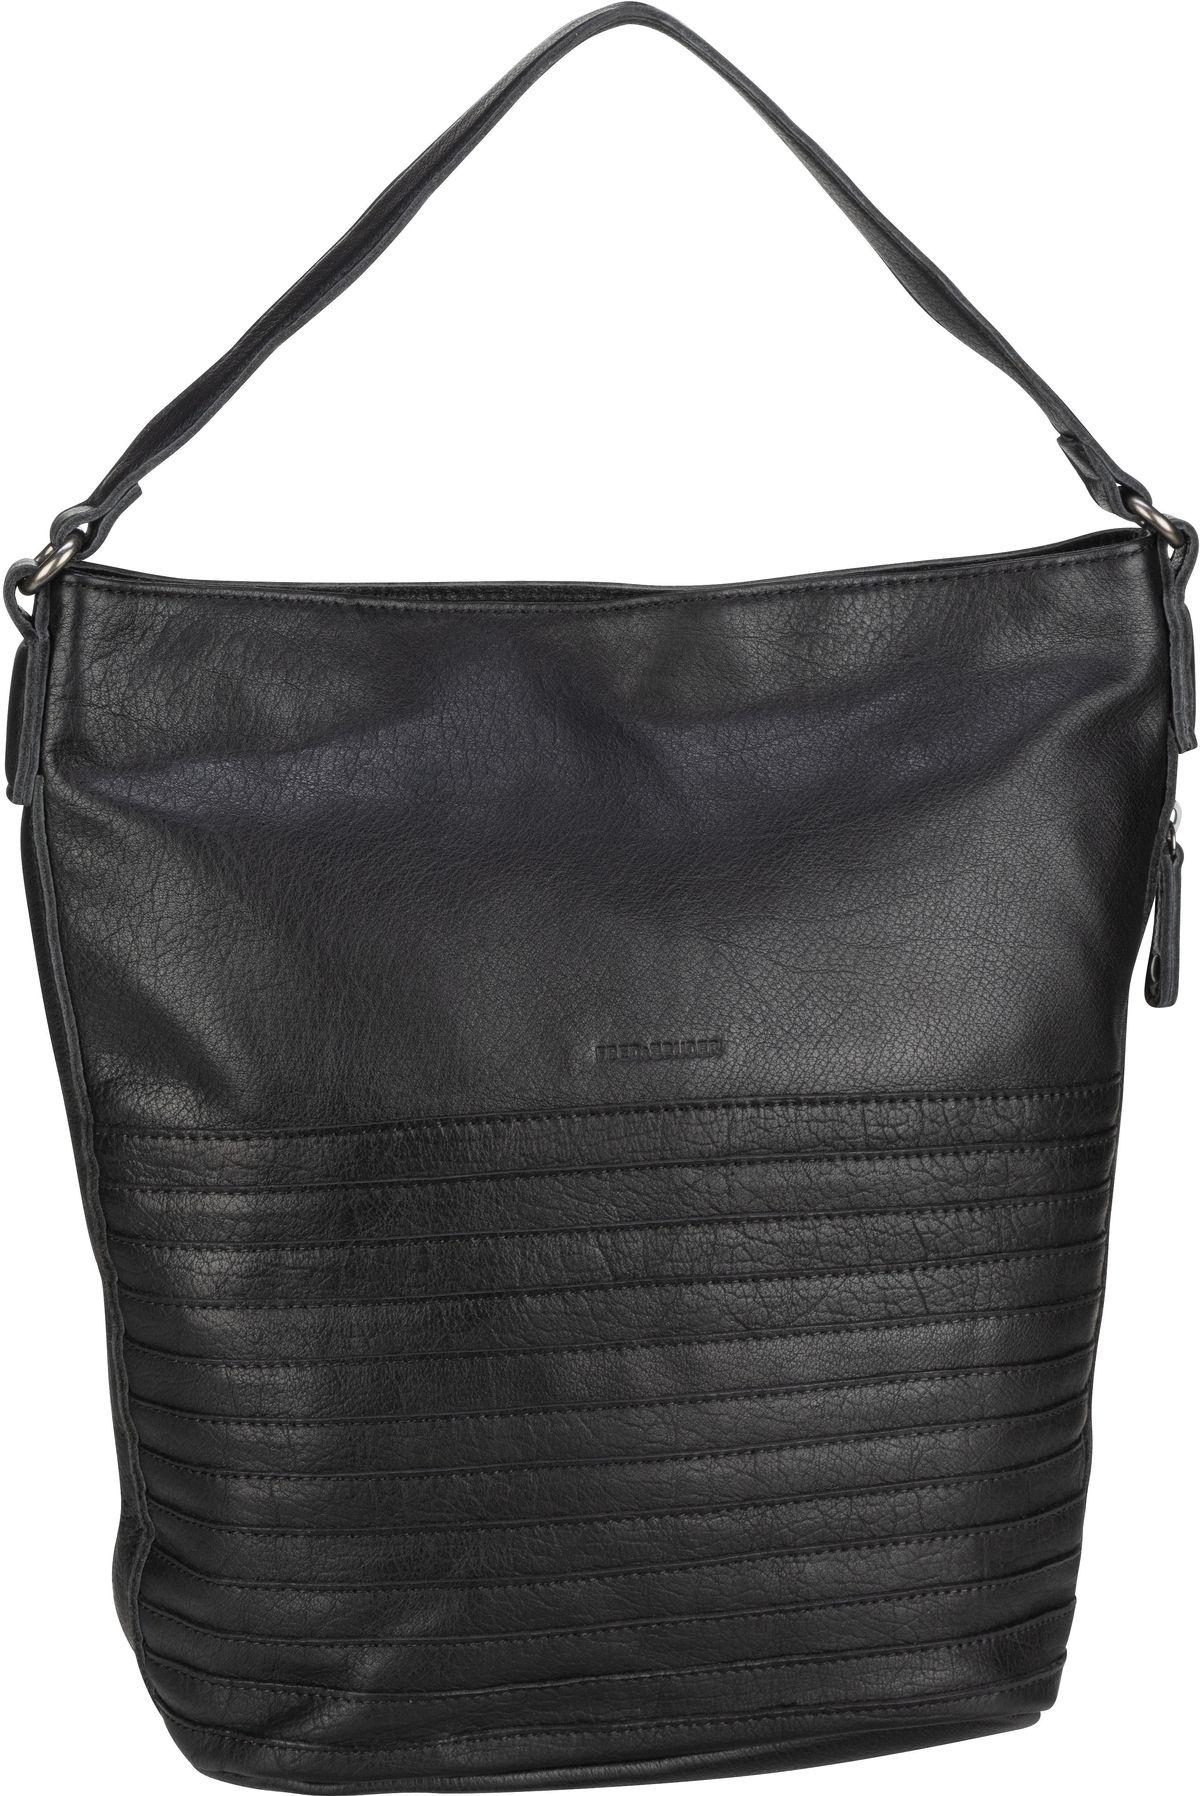 Handtasche Cheri Black